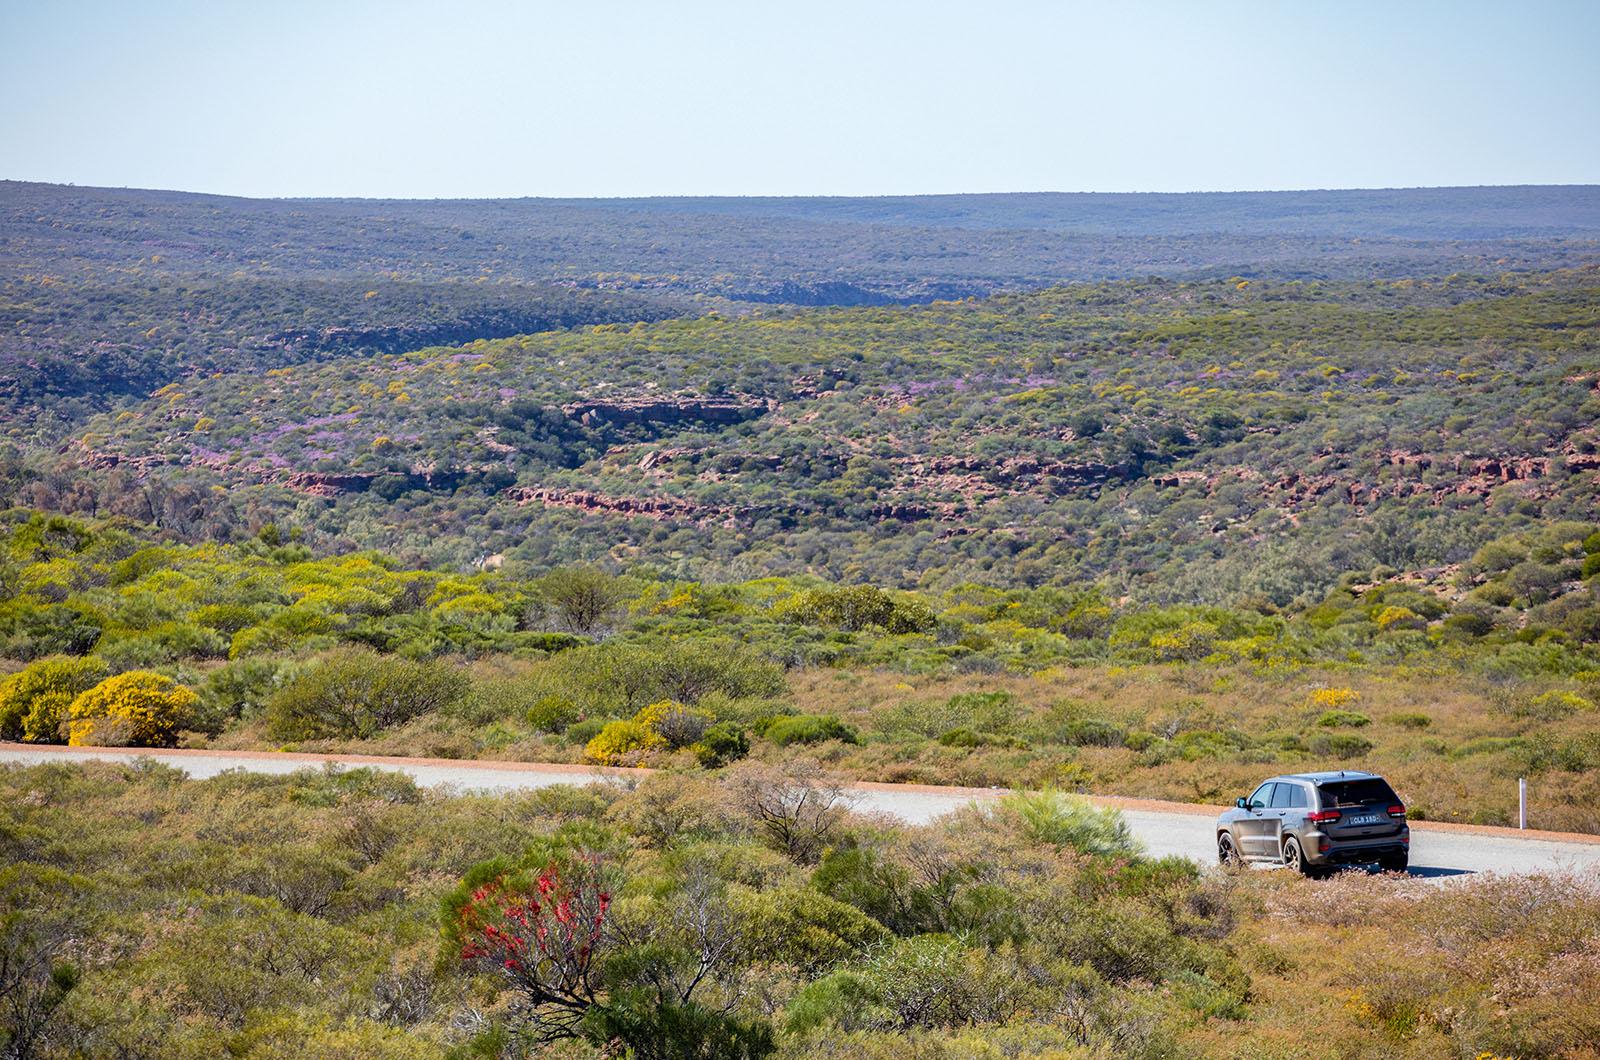 Jeep Grand Cherokee SRT - 468bhp Hemi V8 ventures into the Outback